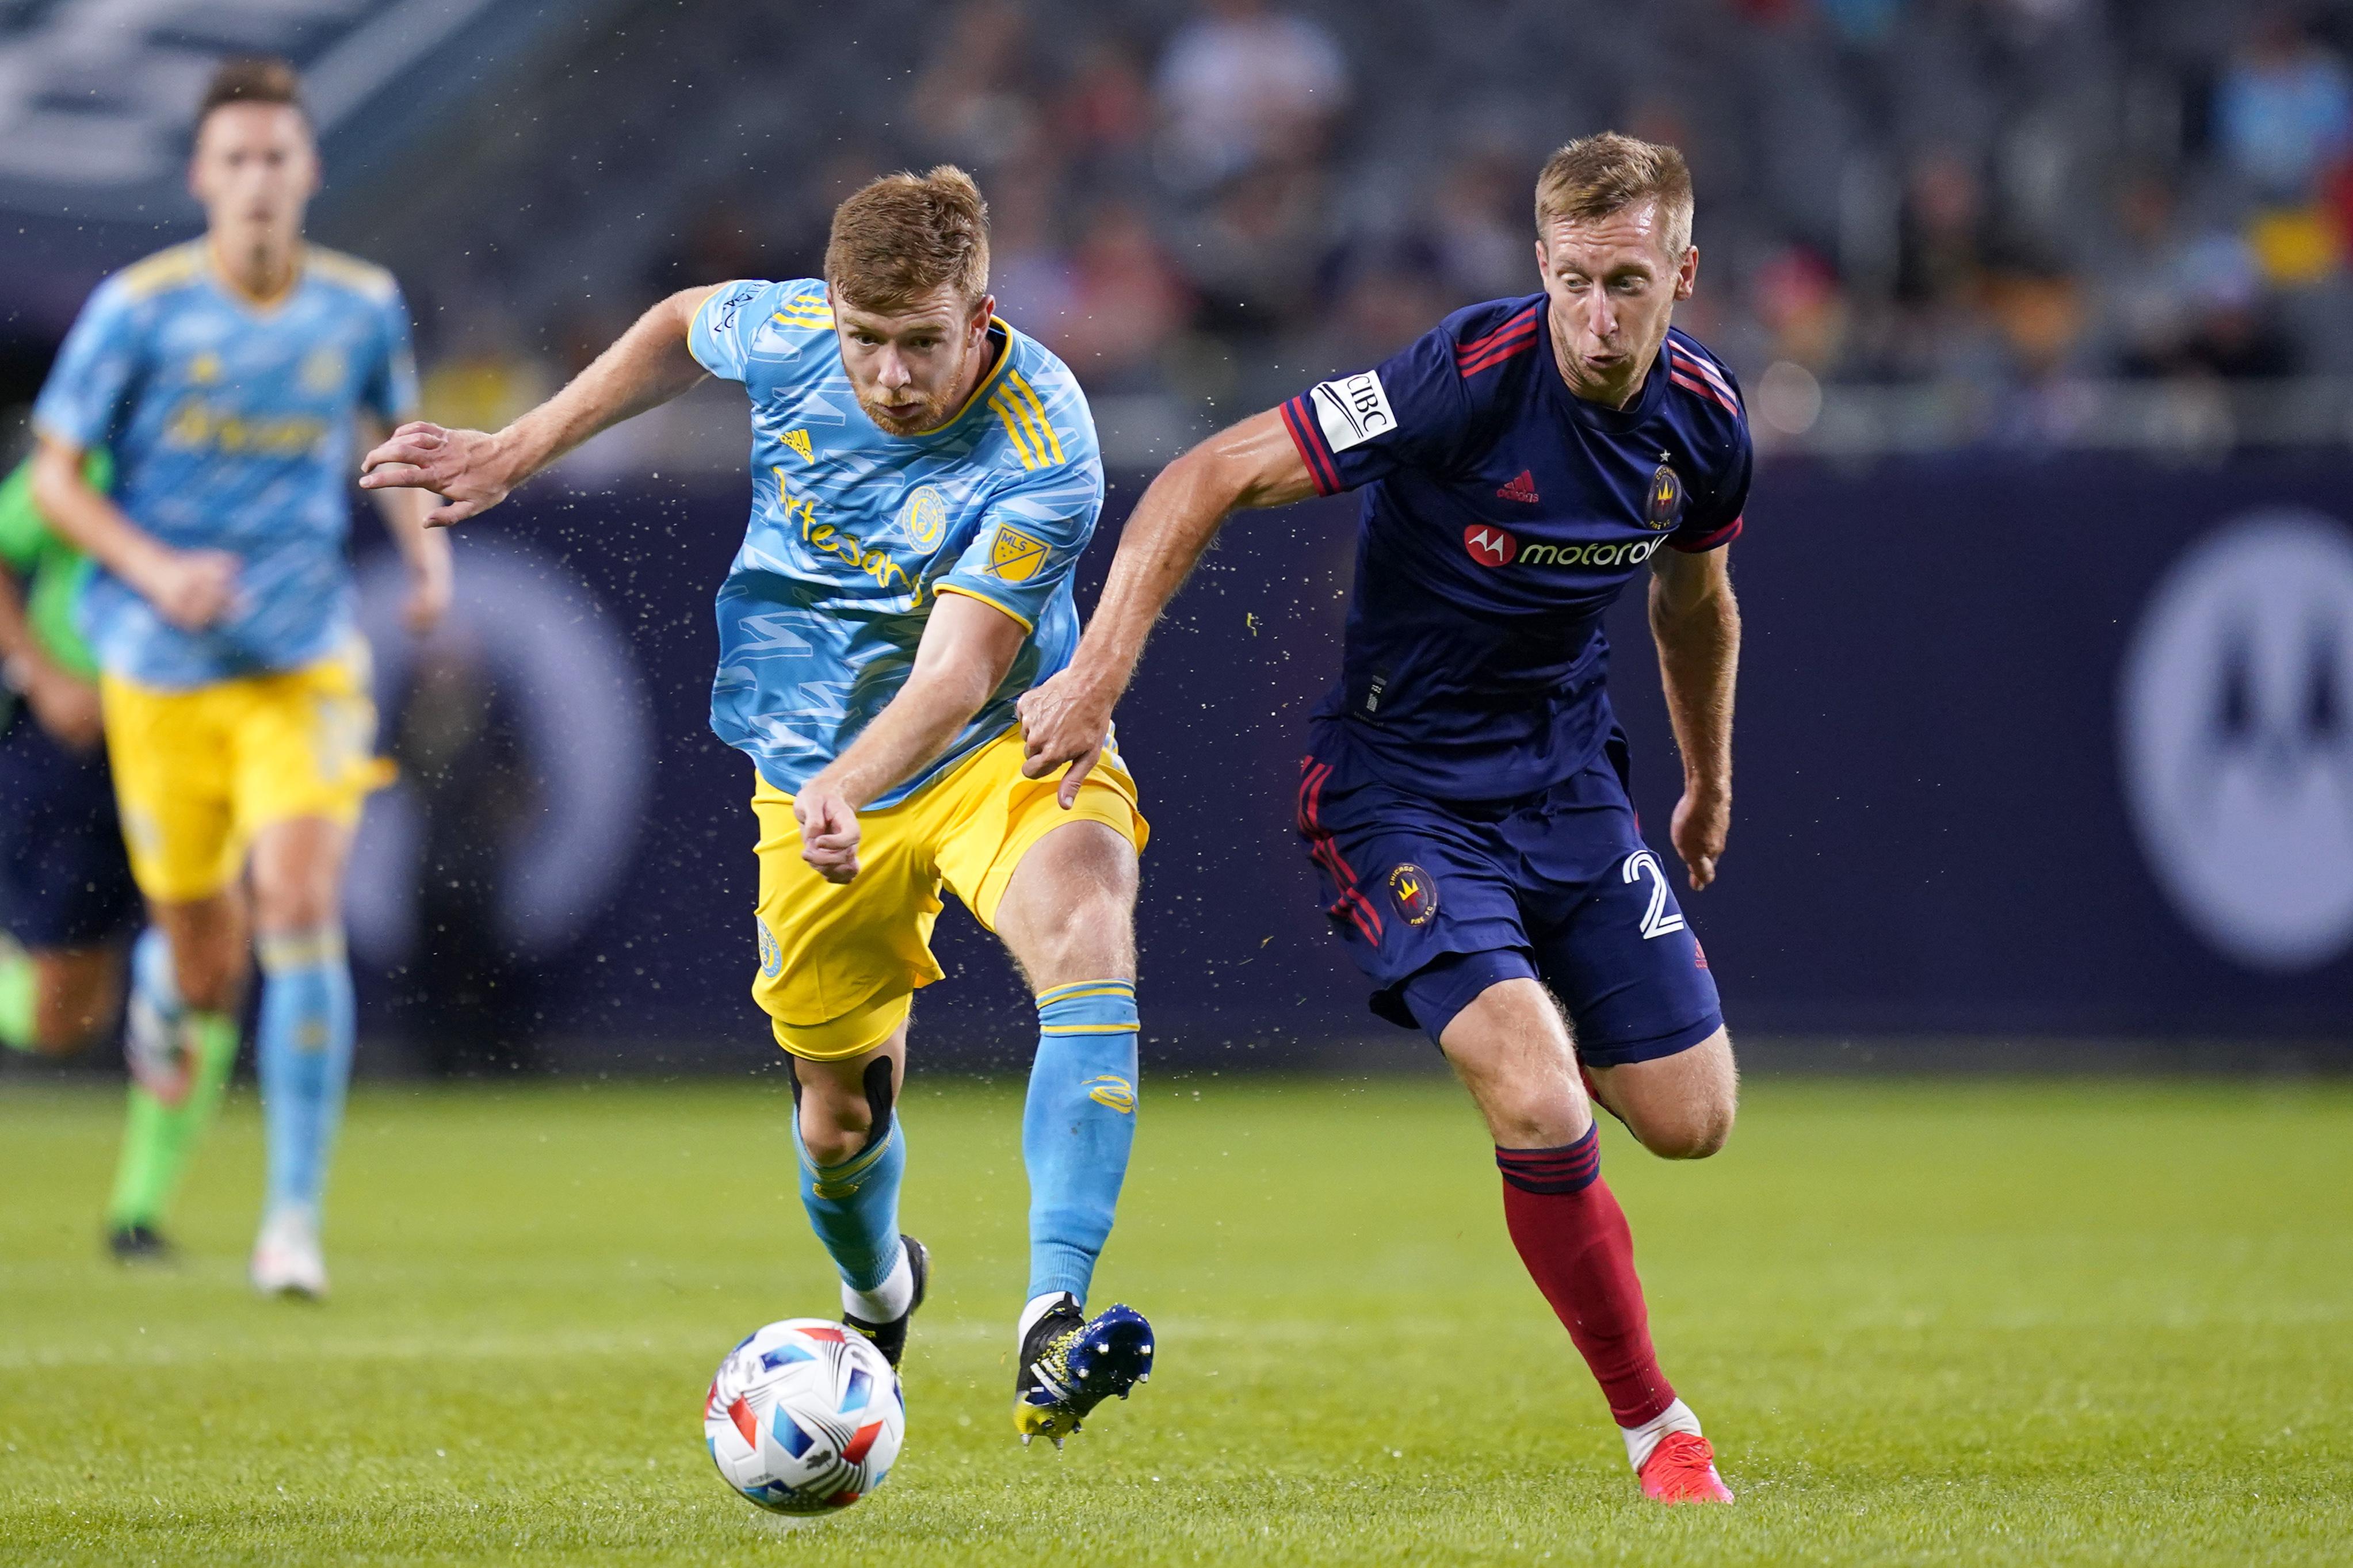 SOCCER: JUN 26 MLS - Philadelphia Union at Chicago Fire FC